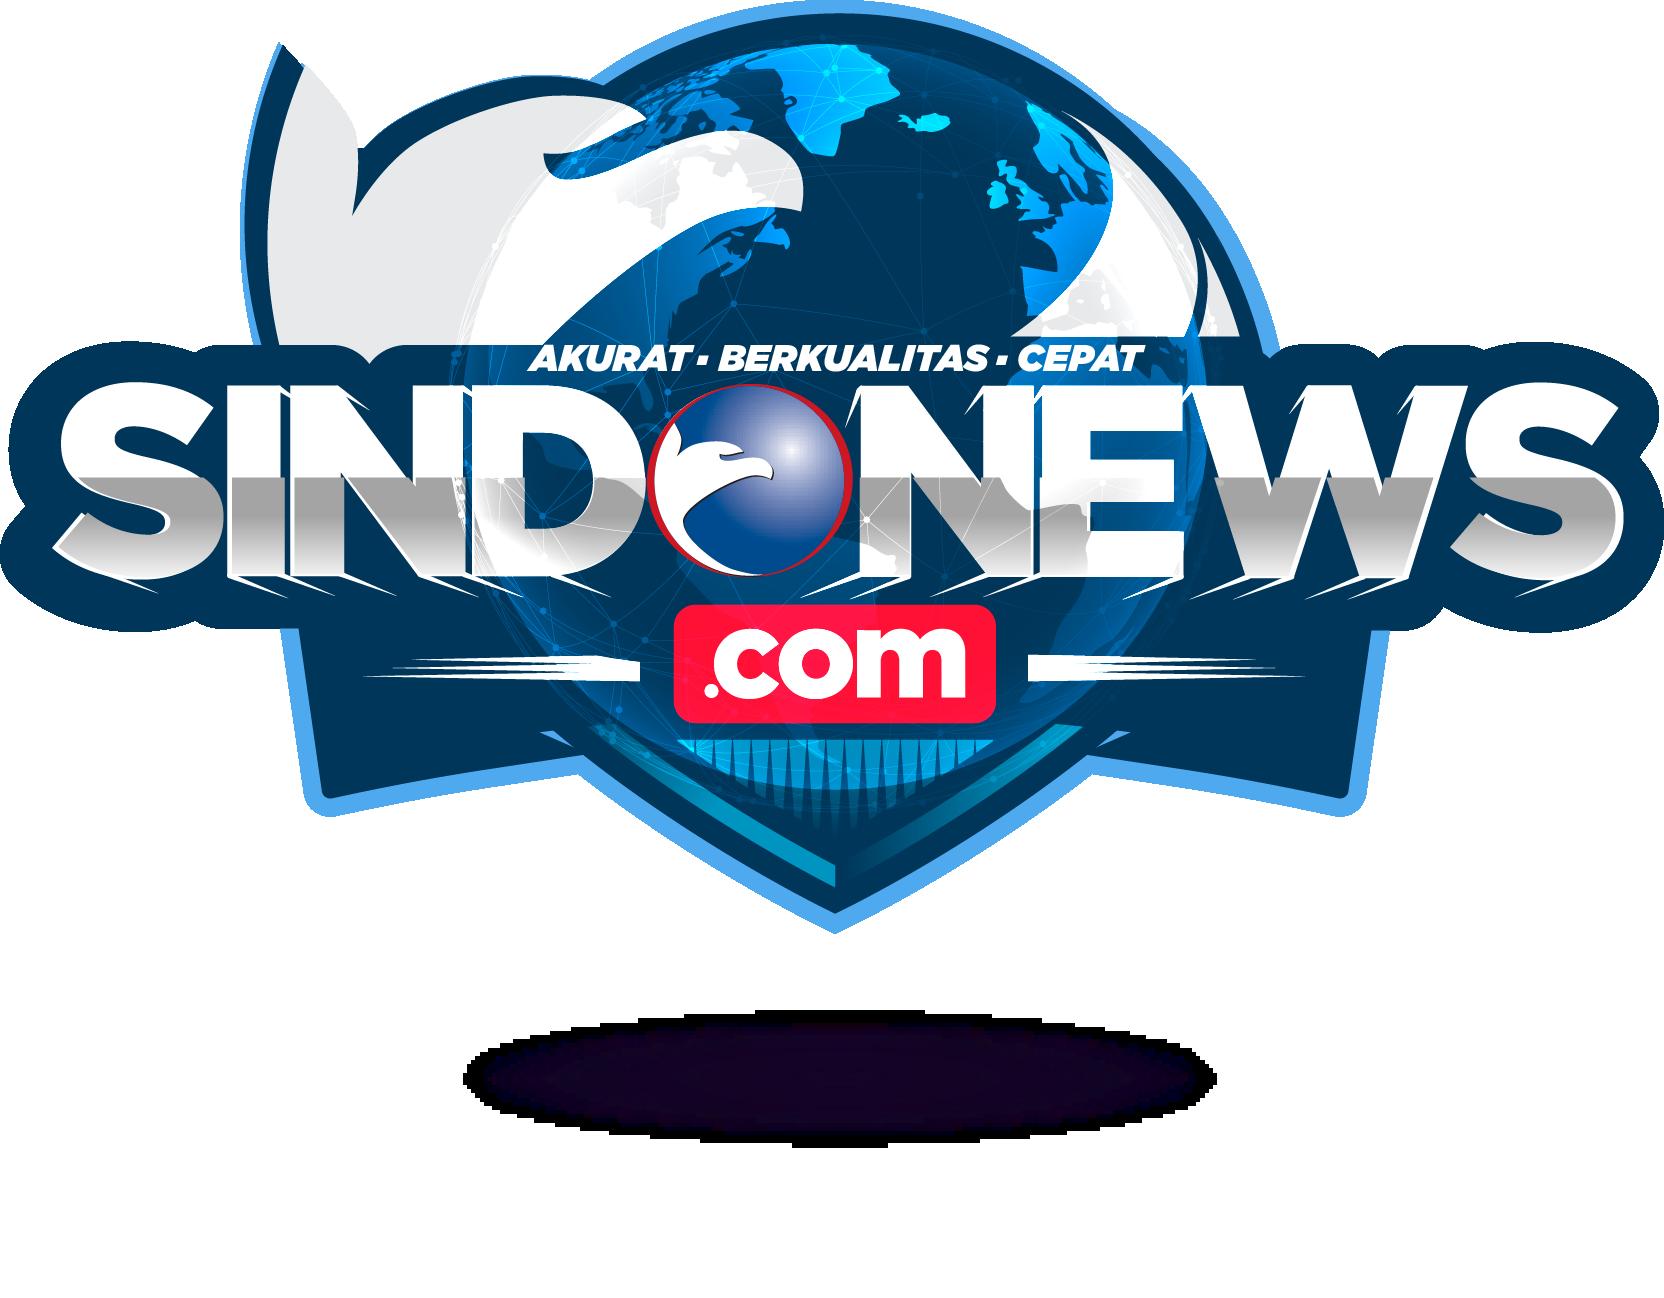 About SINDOnews